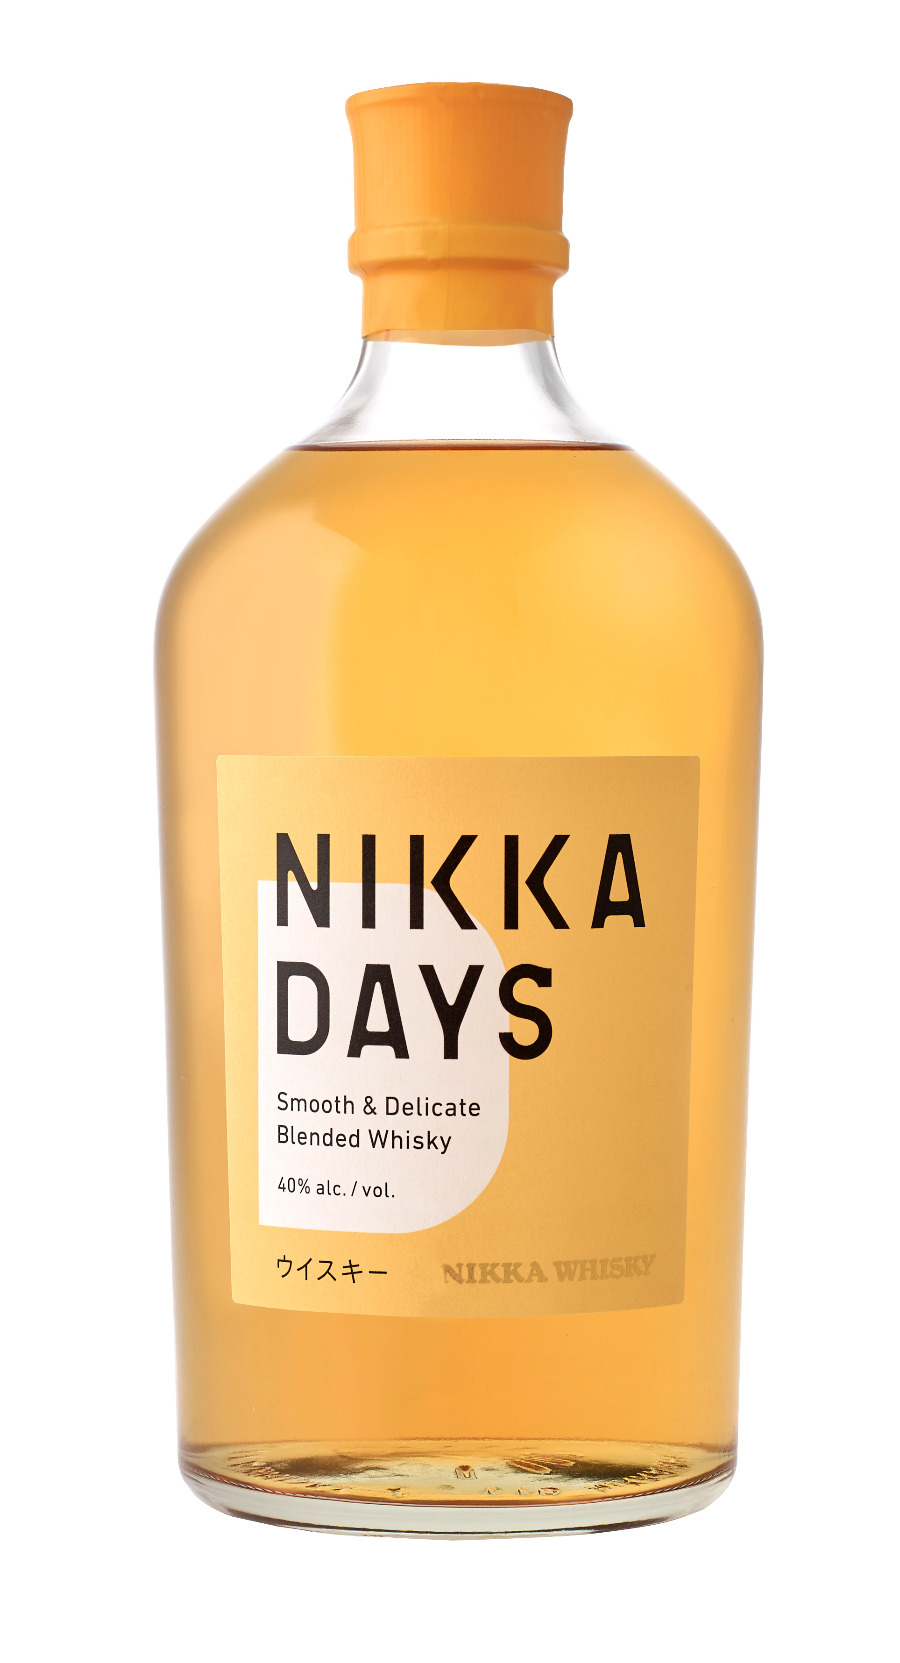 NIKKA Whisky erweitert Range um NIKKA Days